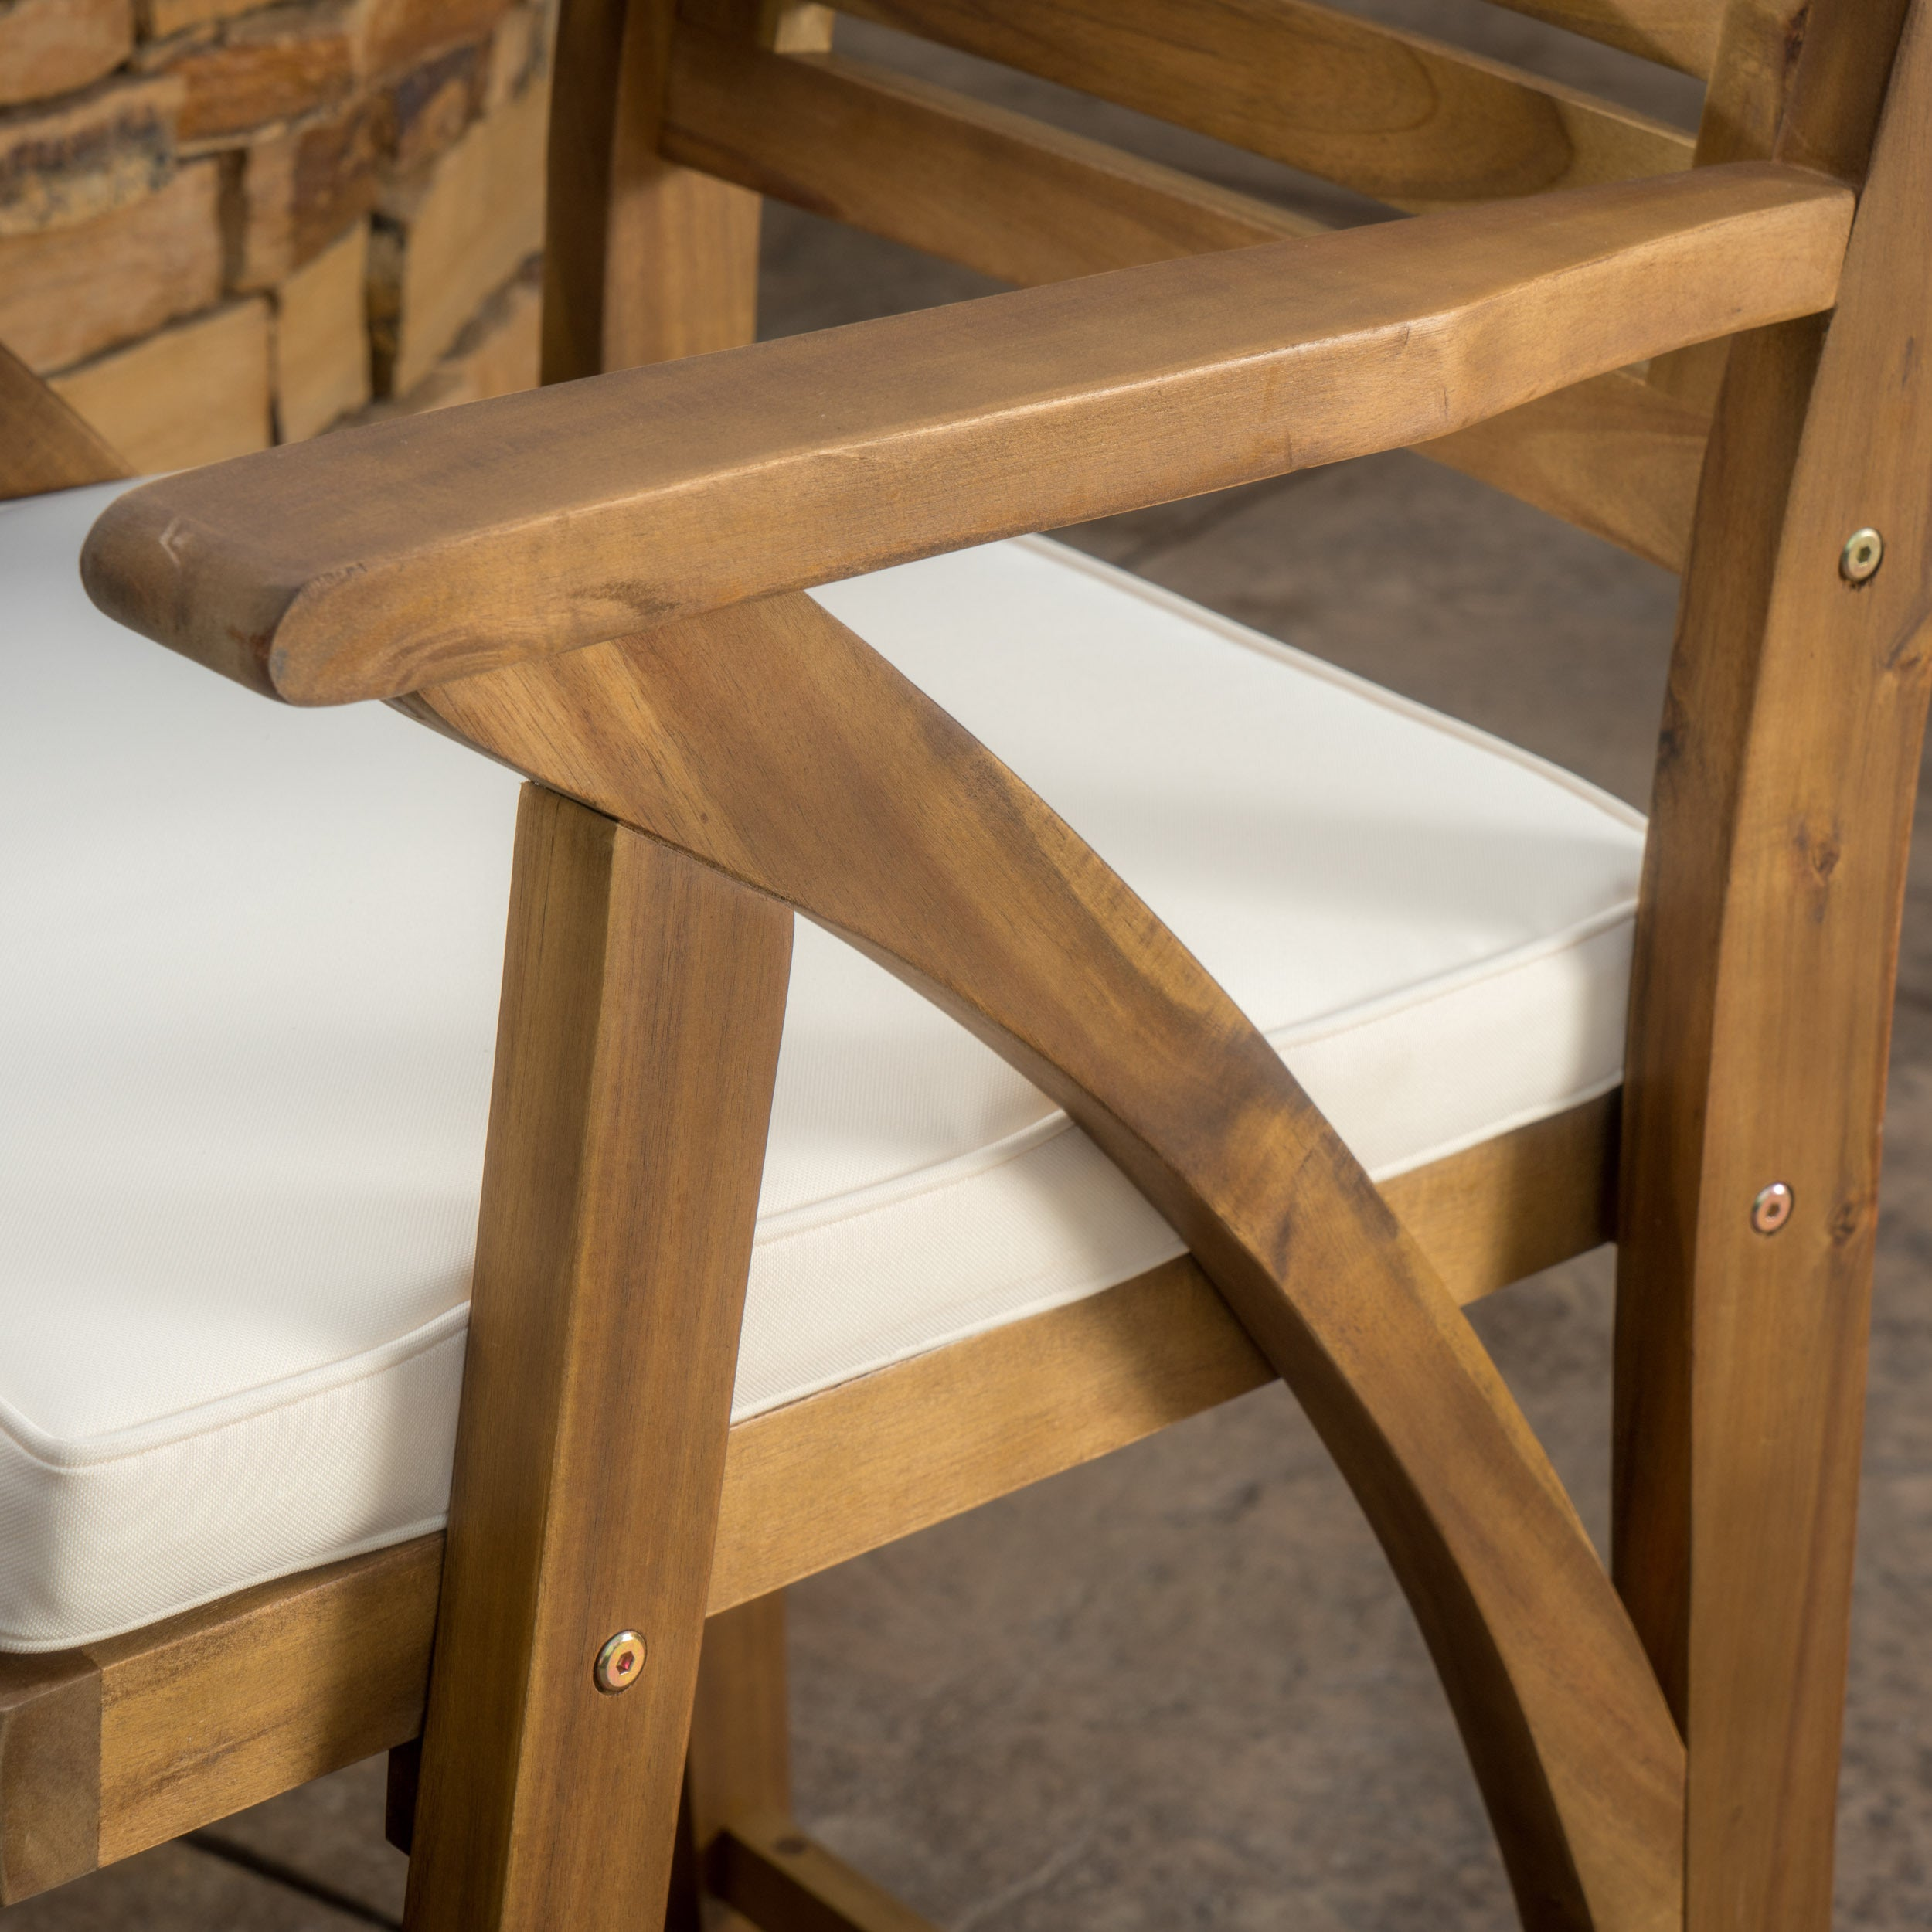 Hermosa-Outdoor-Acacia-Wood-Barstool-with-Cushion-Set-of-2 thumbnail 10